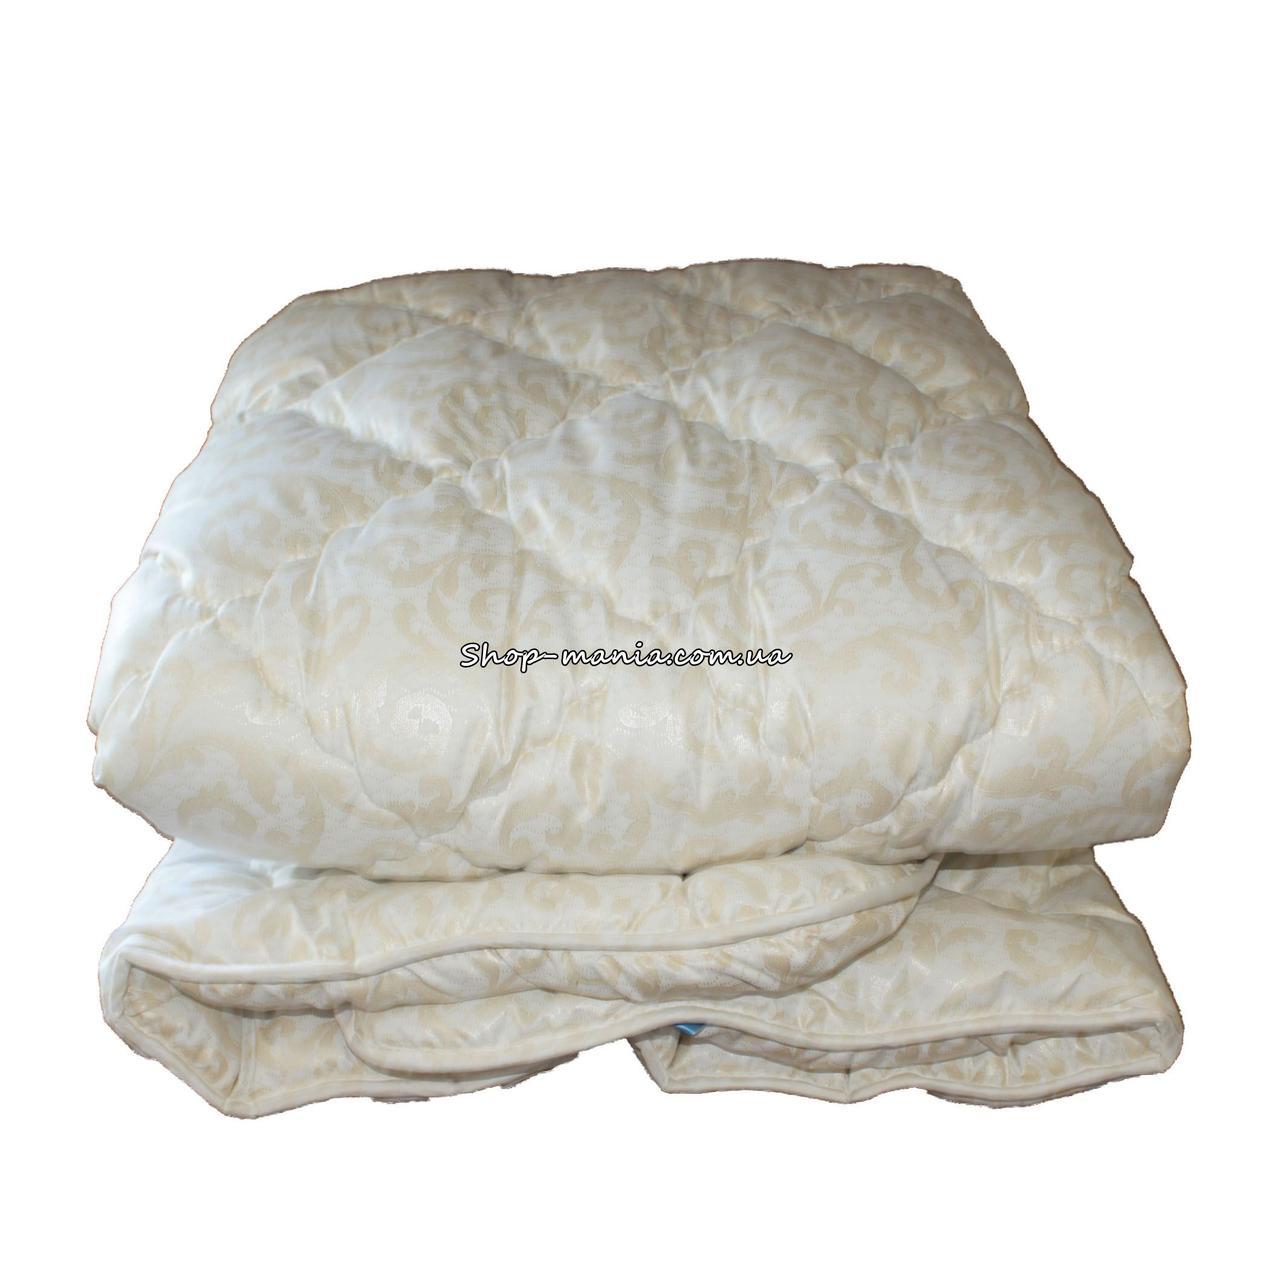 Одеяло зимнее теплое стеганное евро 200х220 см холлофайбер ODA SM 8008 biege